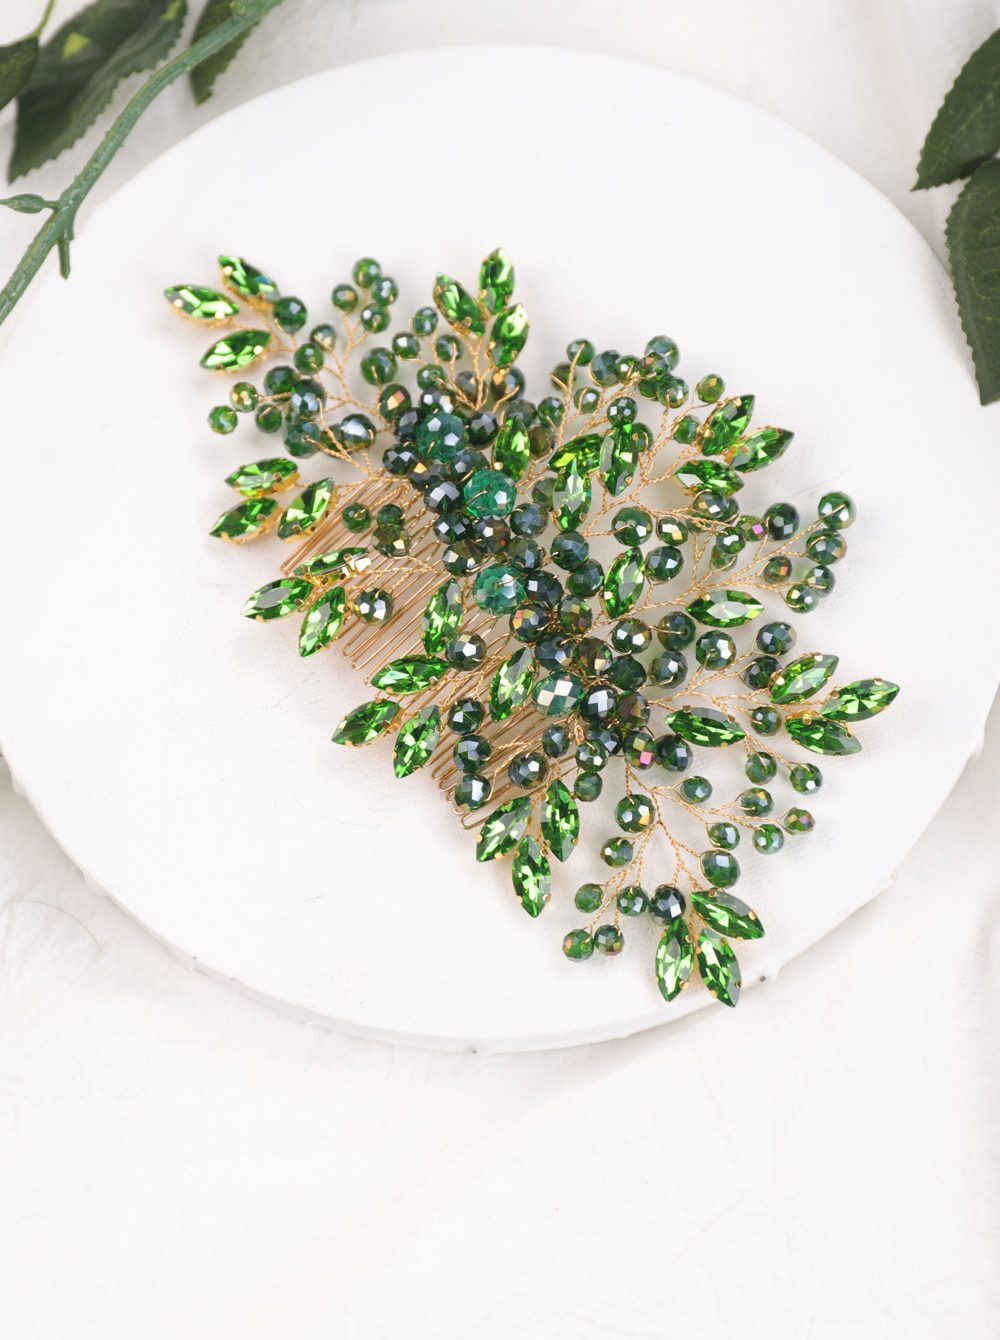 Bohemian Black Red Green Crystal Women Hair Combs Bridal Hair Accessories Wedding Hair Jewelry Head Decoration Hair Ornament